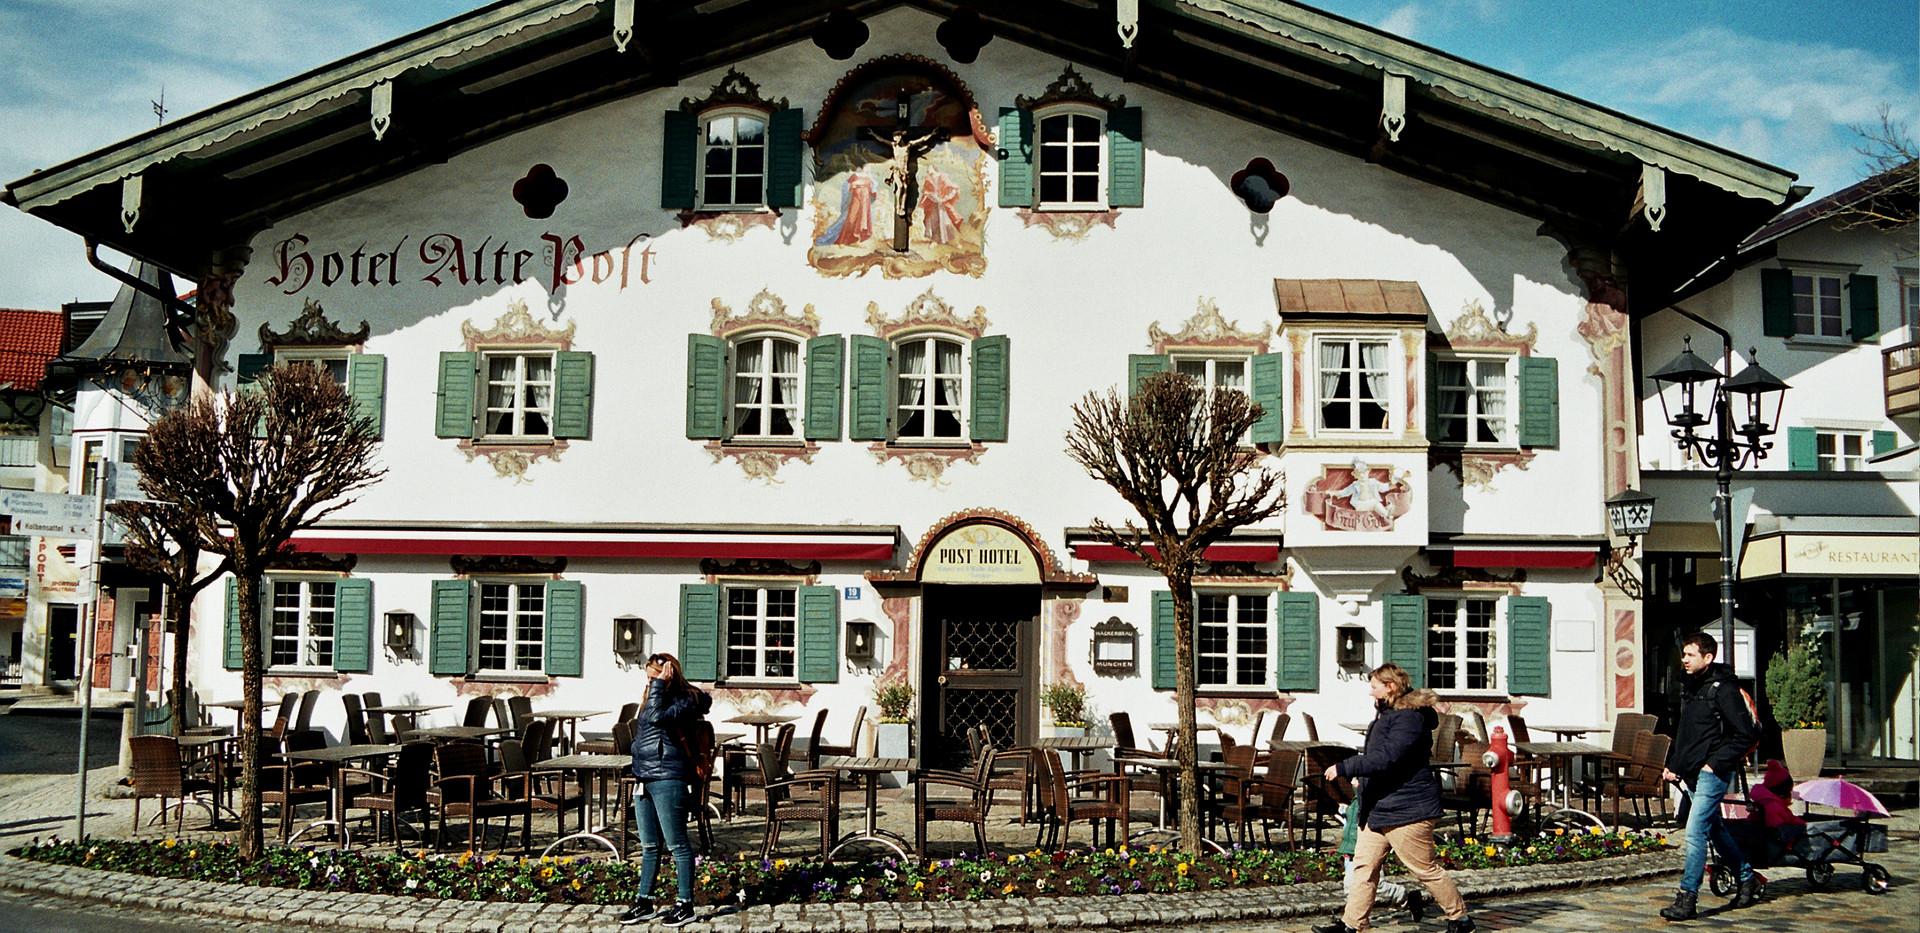 Oberammergau, Germany, April 2018